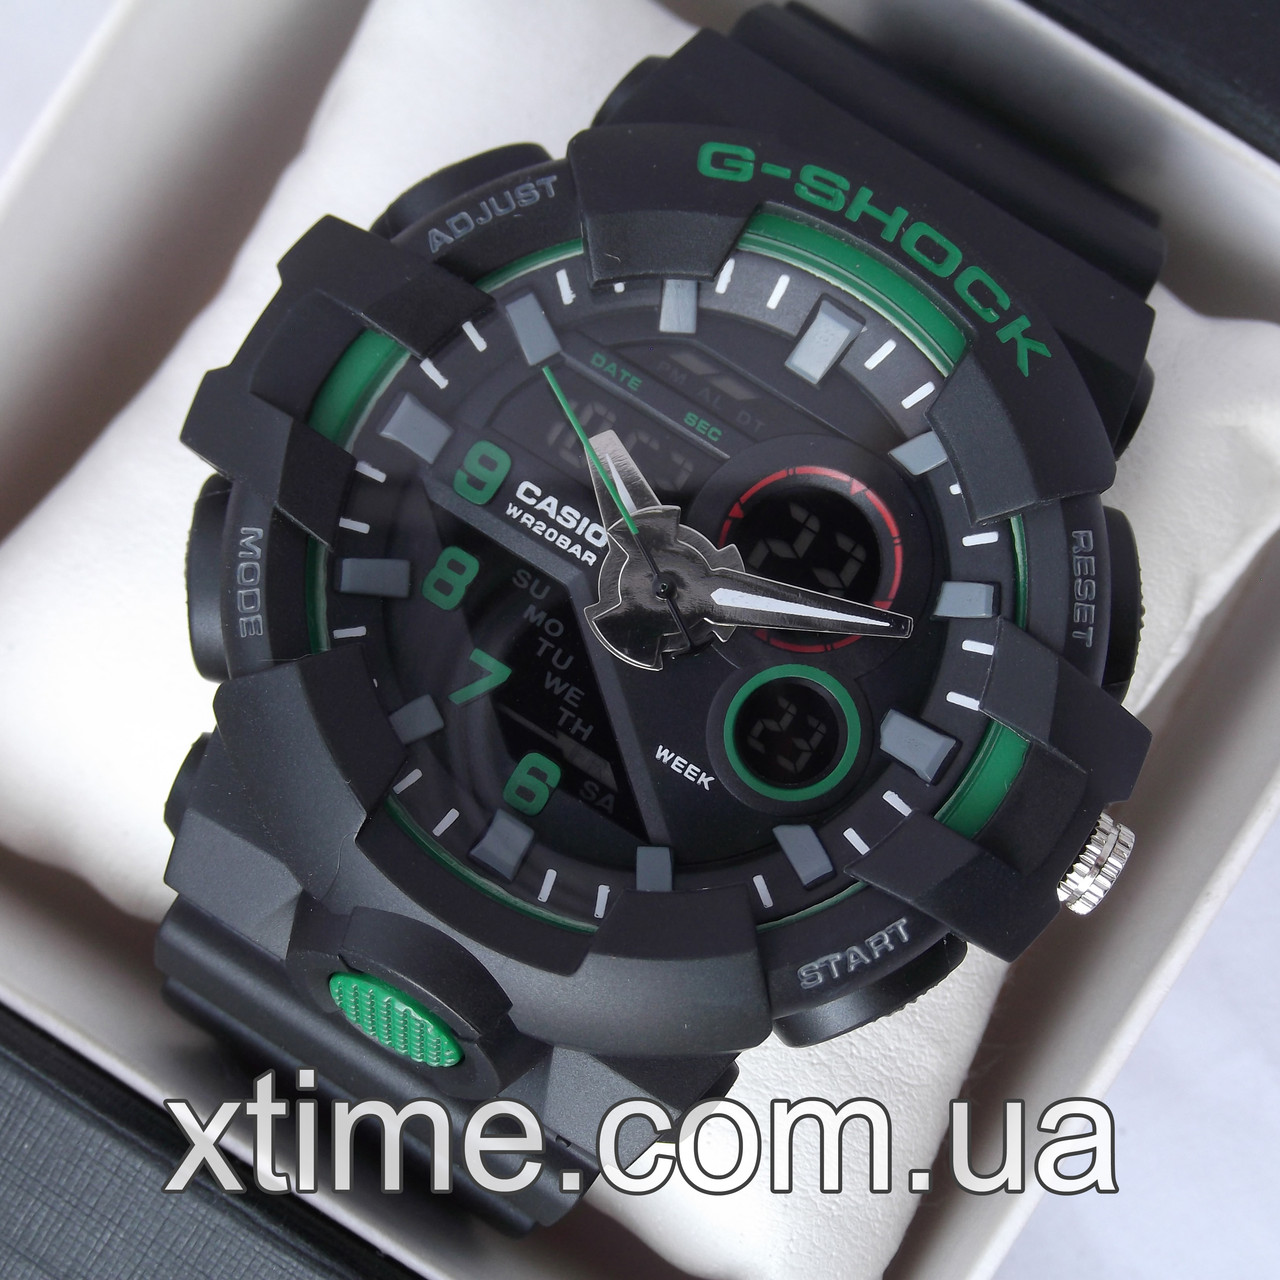 on sale ec89d 6ad5b Мужские наручные часы G-Shock GA-700 5522: продажа, цена в Харькове. часы  наручные и карманные от